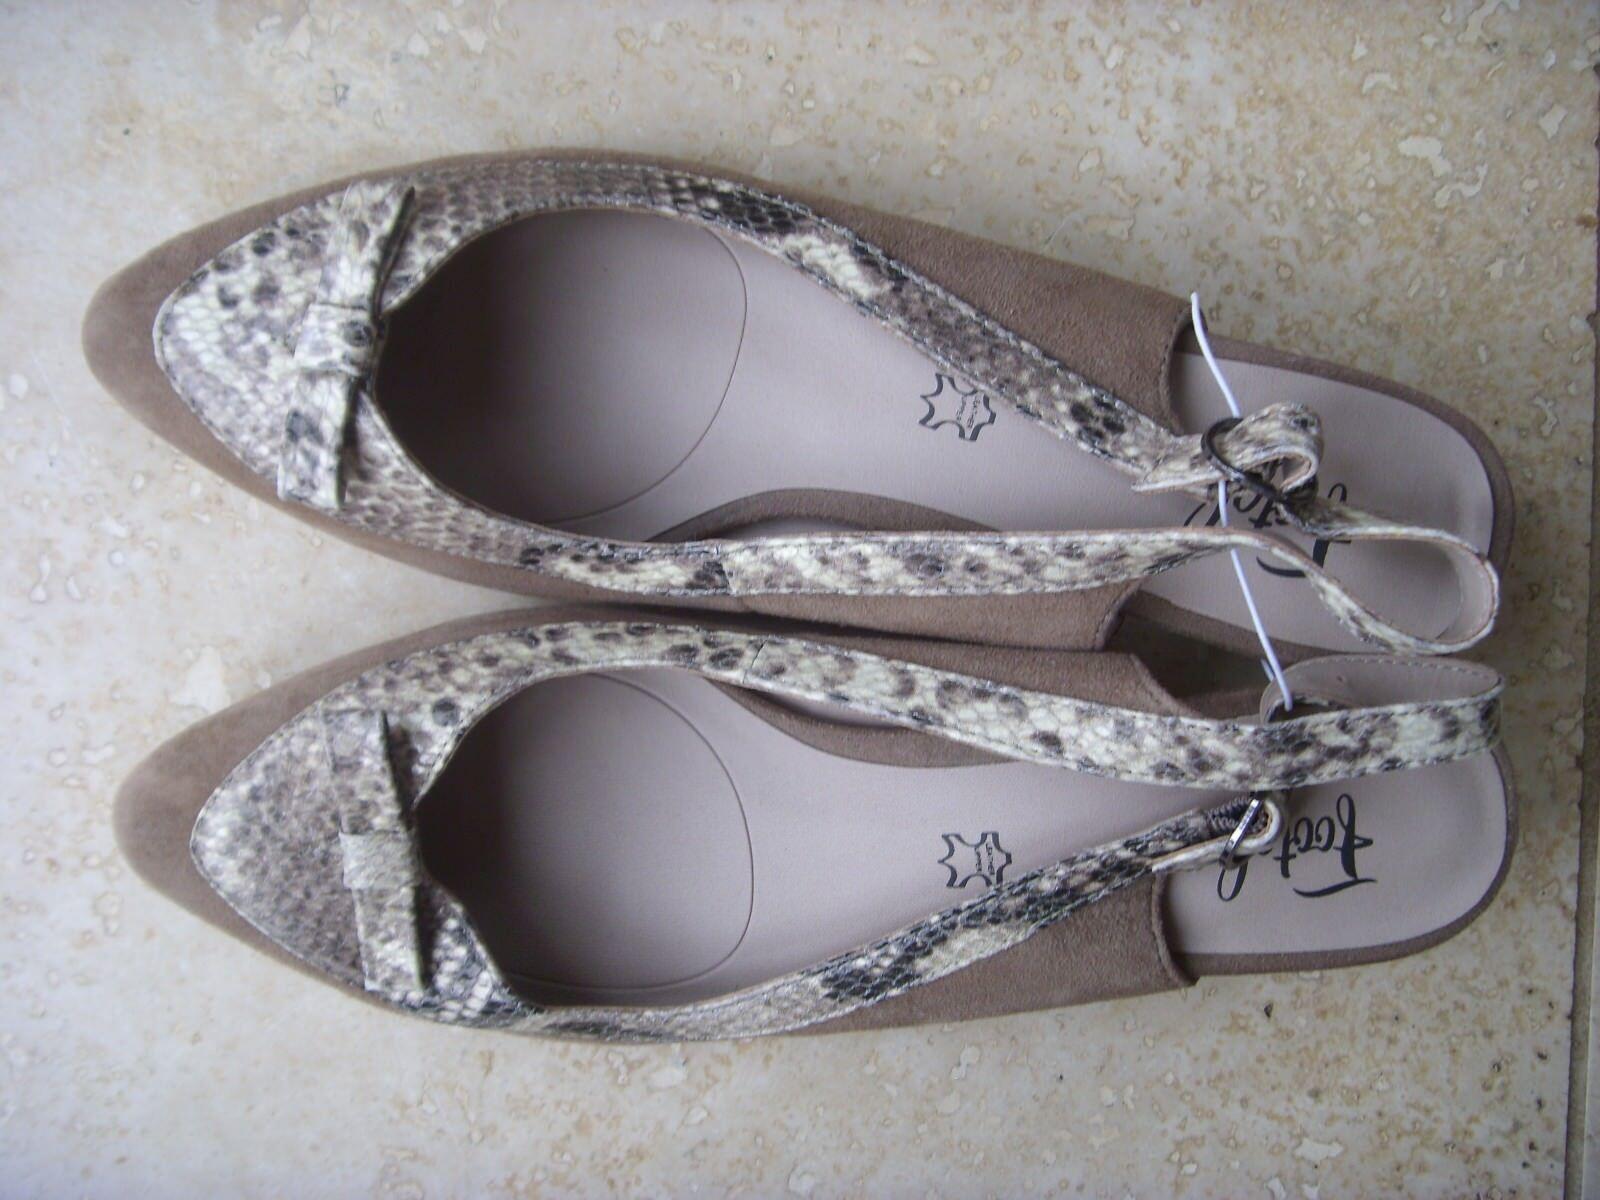 M&S ladies footglove sling R.R.P back sandals size 4.5 R.R.P sling .50 8c3f87